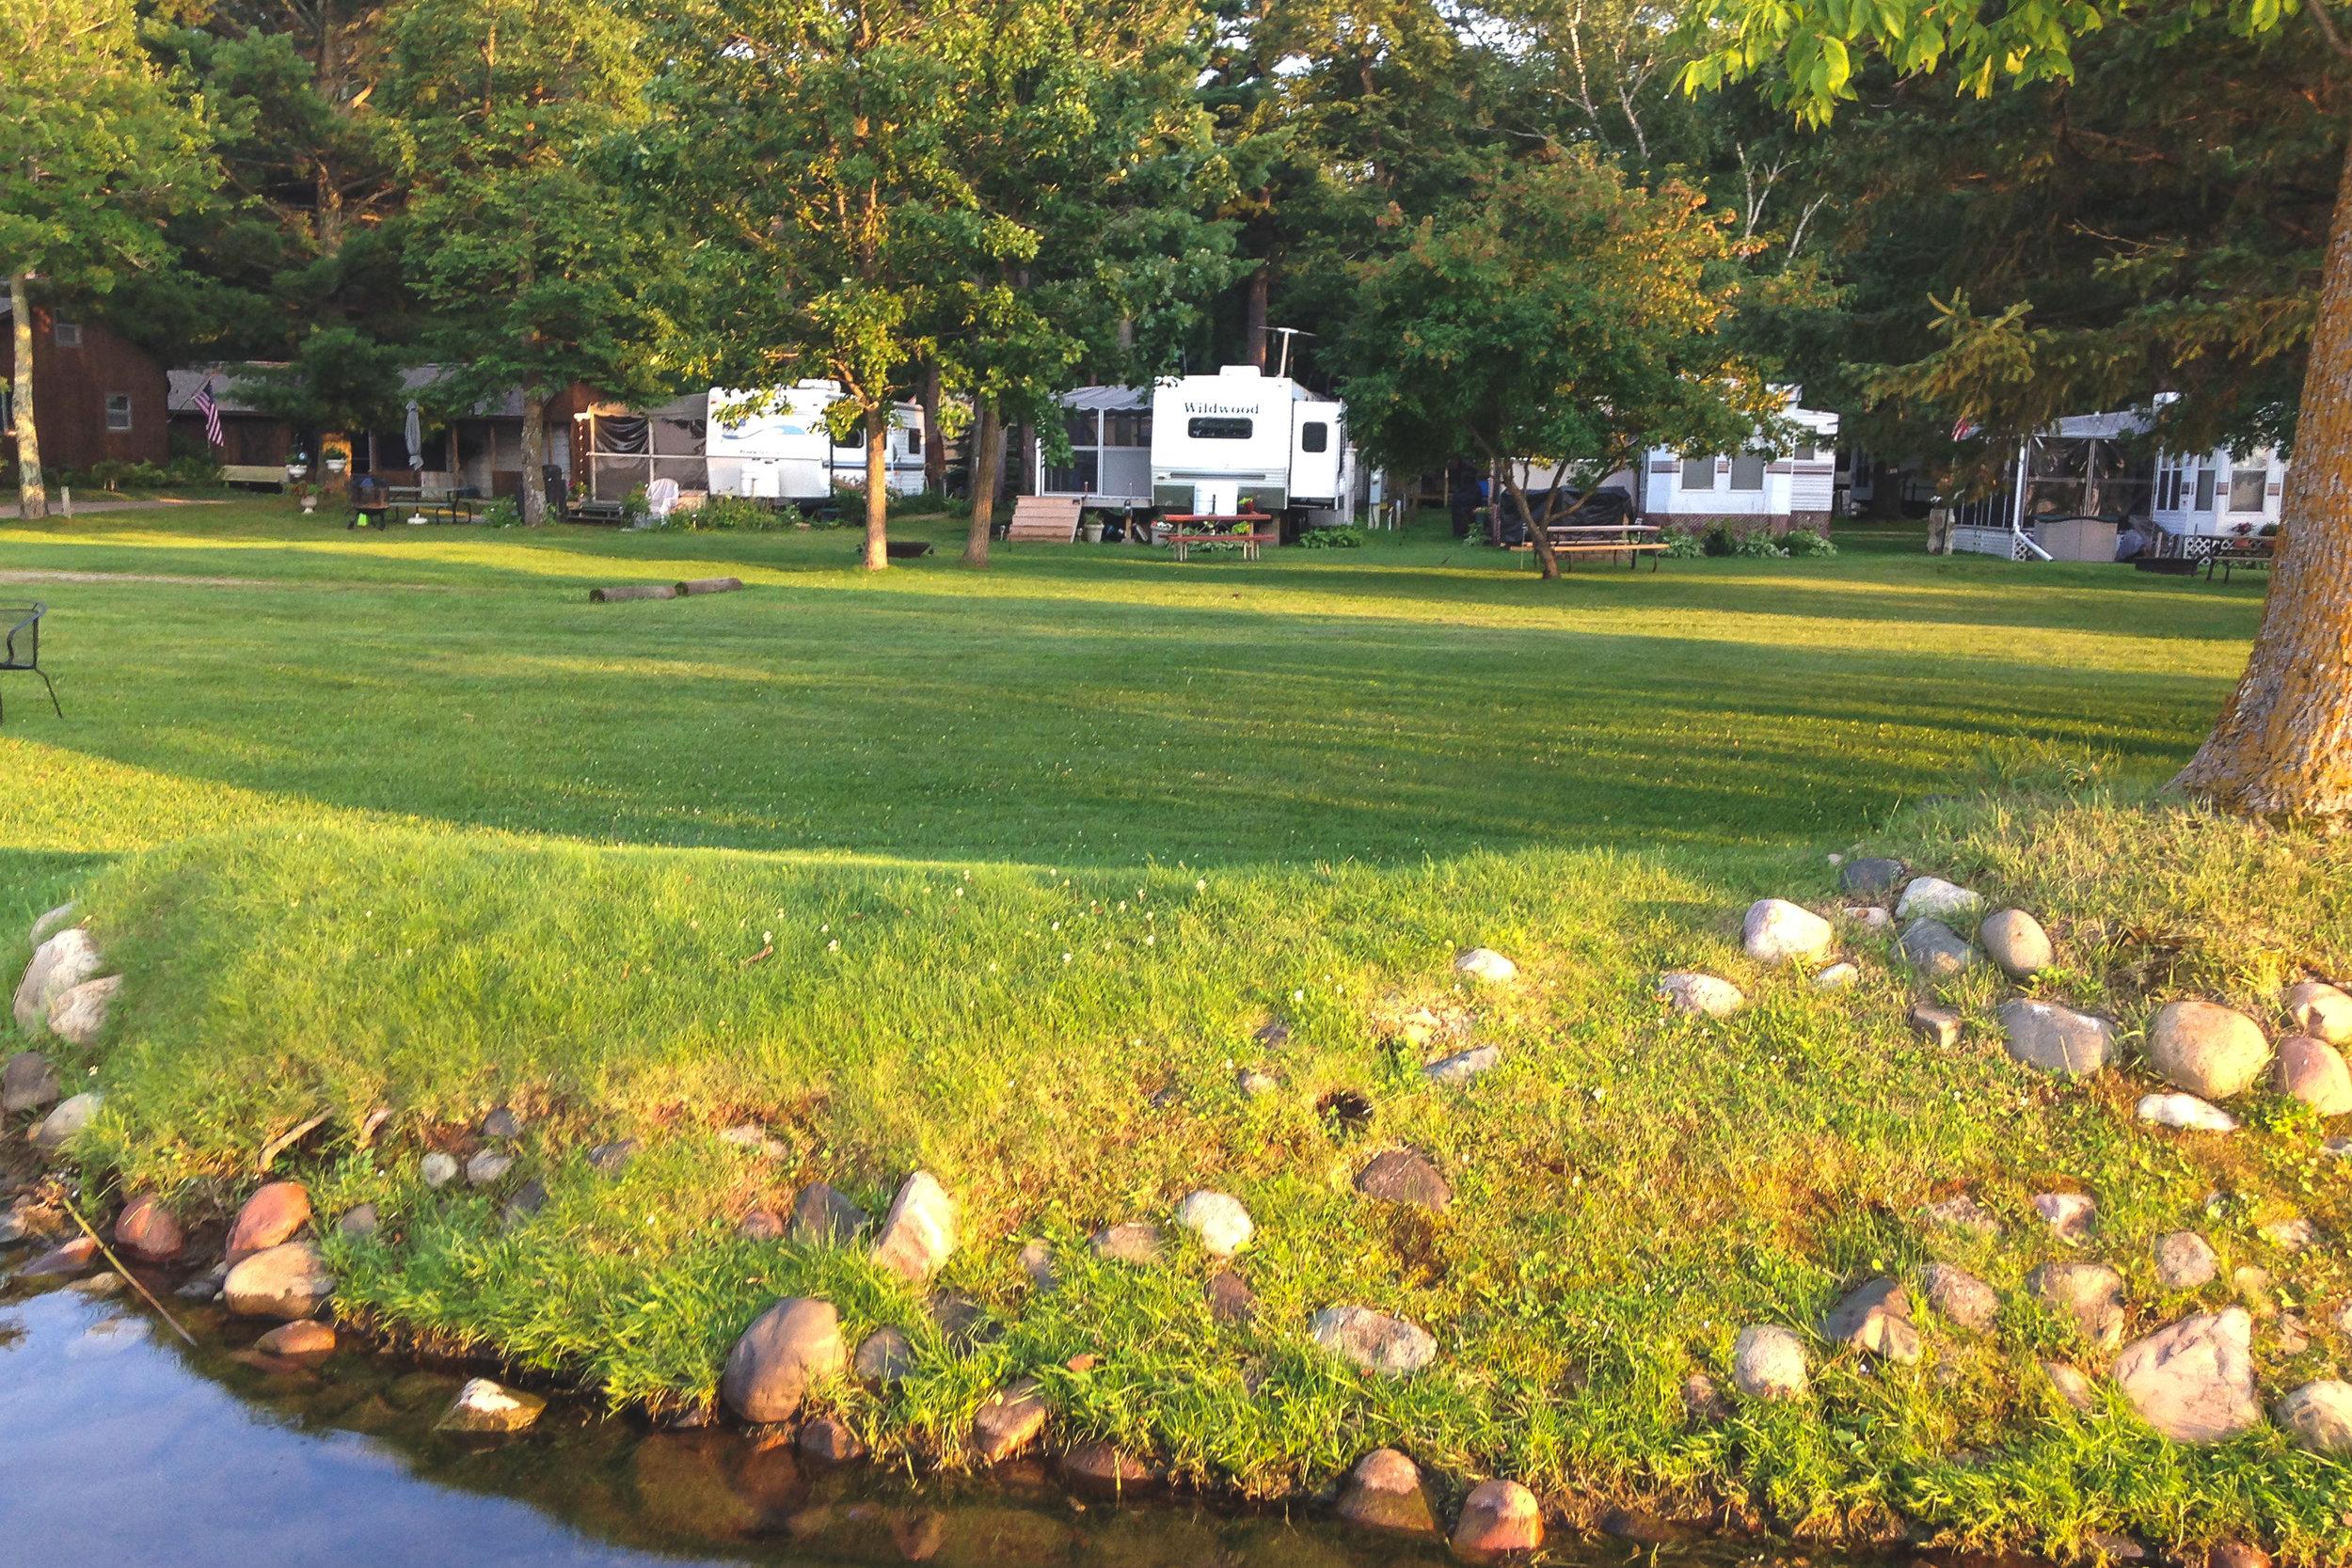 brainerd_lakes_area_campground (7 of 2).jpg